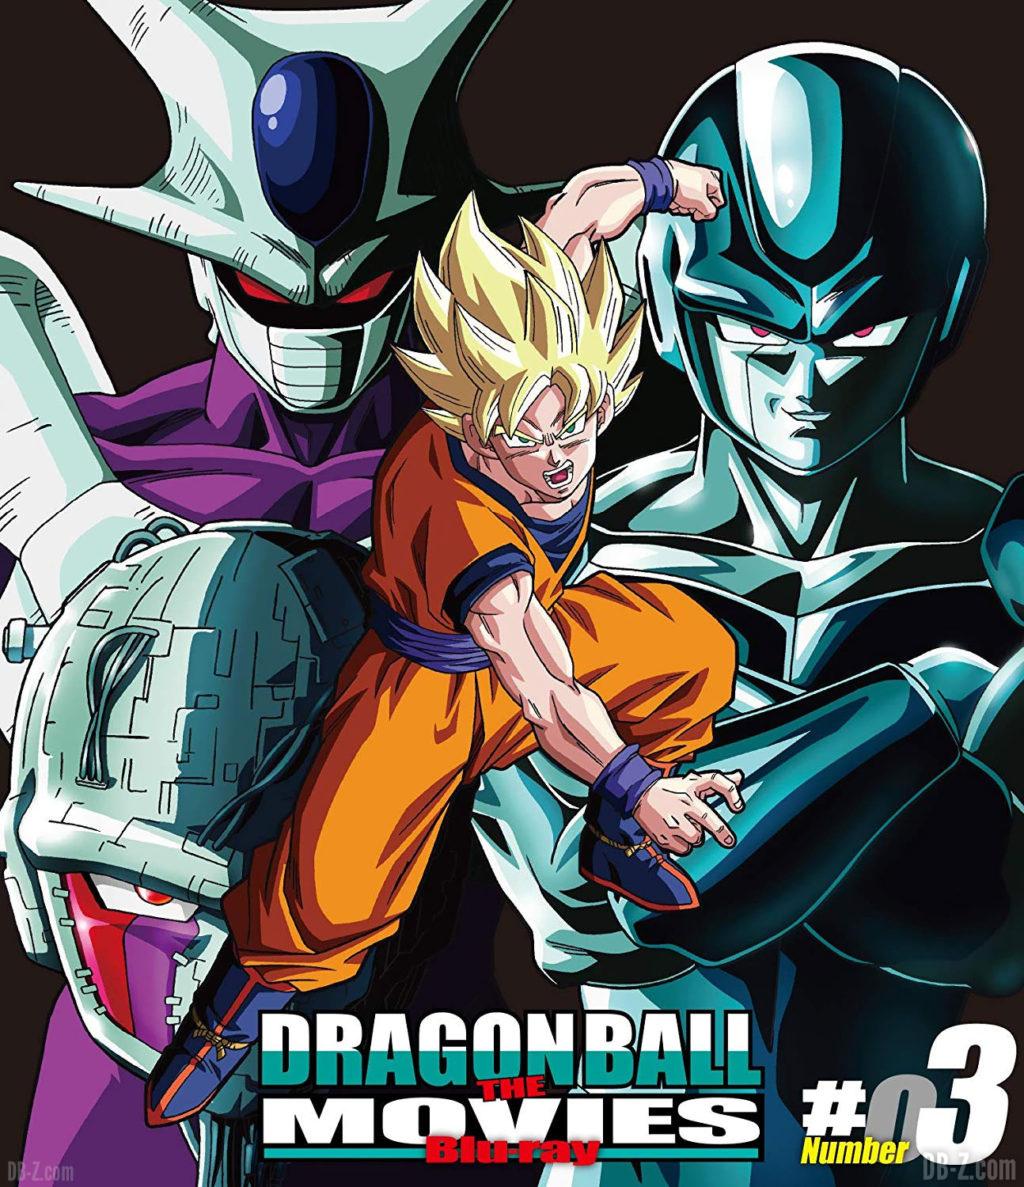 DRAGON BALL THE MOVIES Blu-ray 03